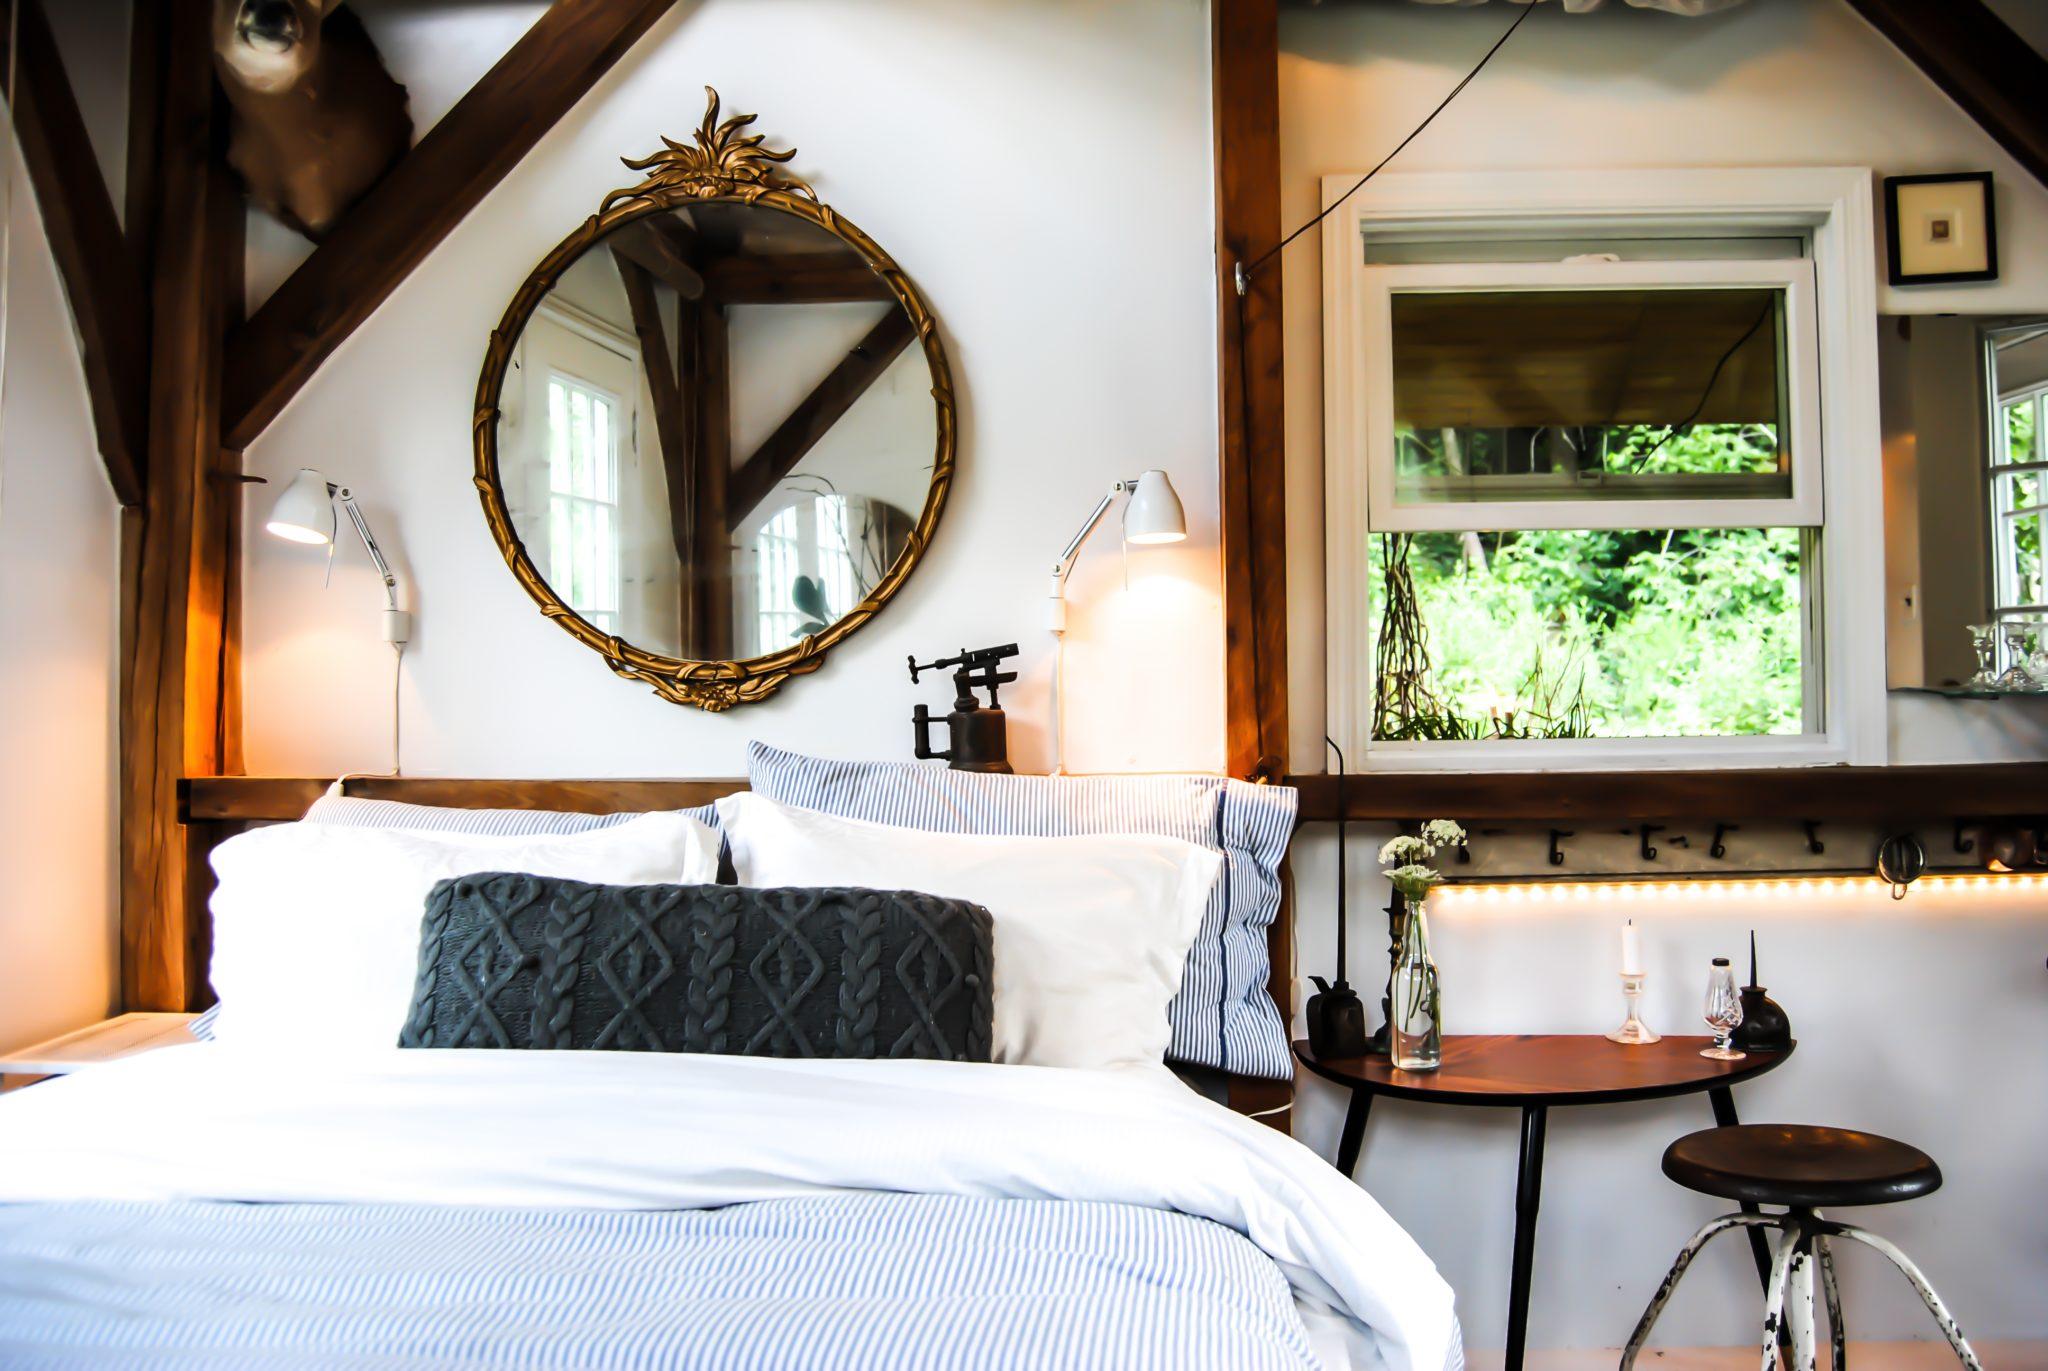 Interior design by Art Home Garden